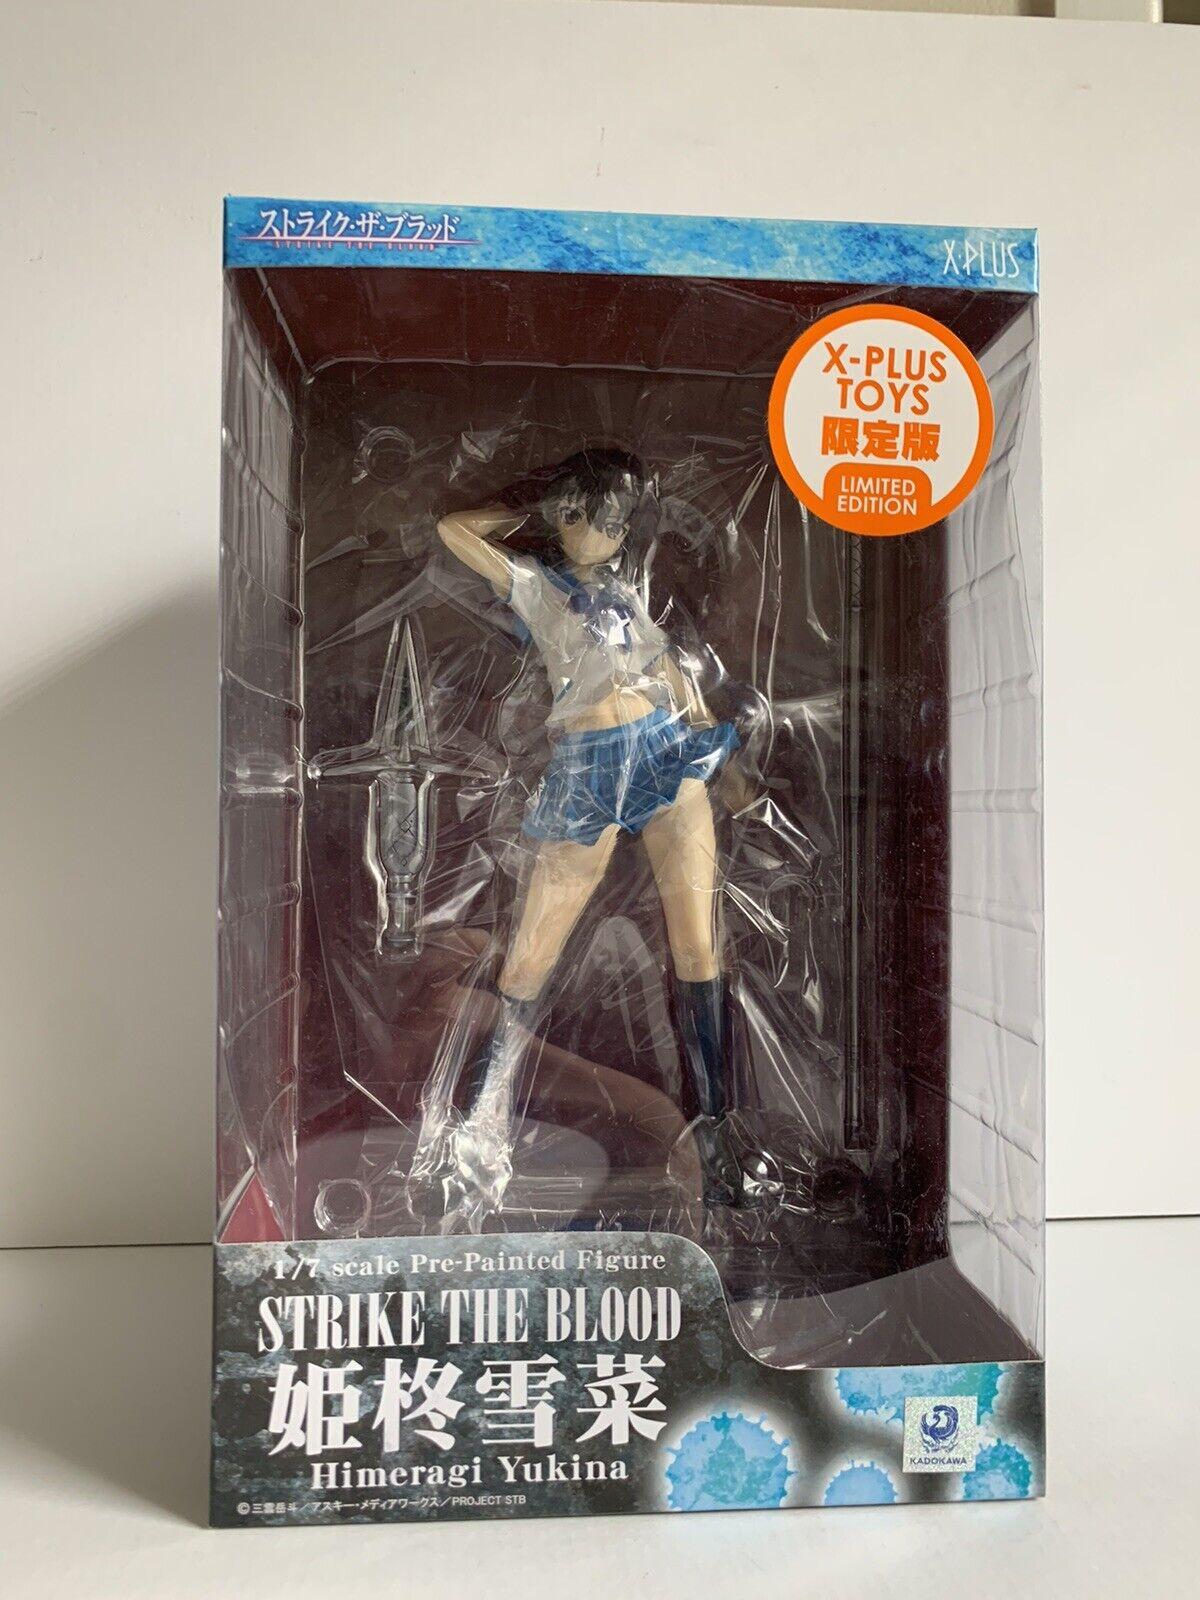 Yukina Himeragi Figure Strike The Blood Alter Yukina Himeragi 1 8 Pvc Figure For Sale Online Ebay strike the blood himeragi yukina limited ver 1 7 pvc figure xplus toys limited